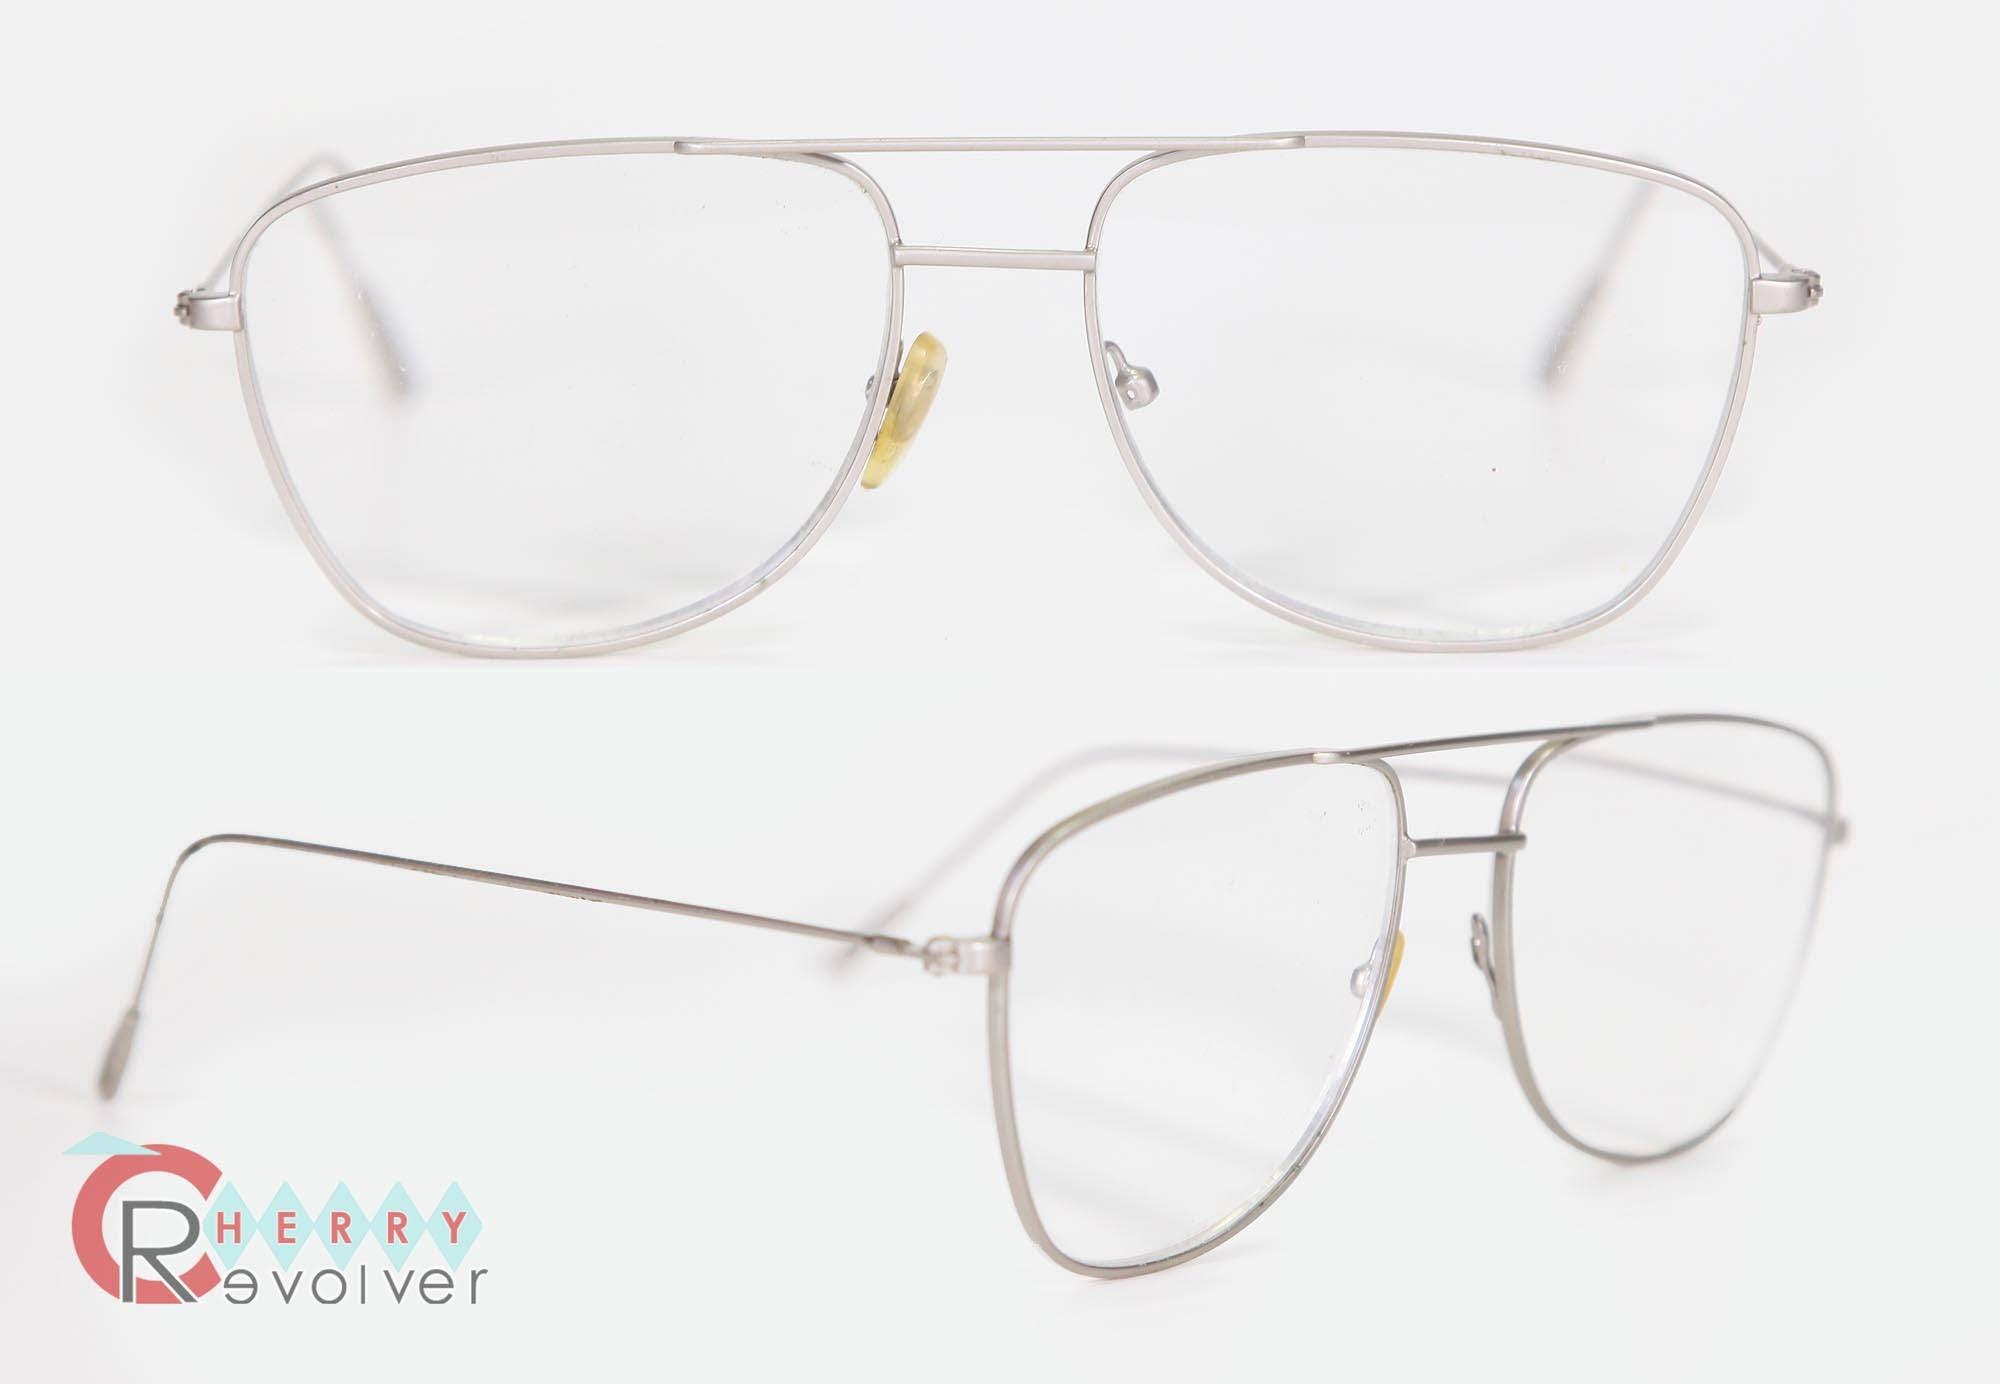 cec96266415 cherryREVOLVER Vintage Silver Wire Aviator Mens Eye Glasses Thin Metal  Frames